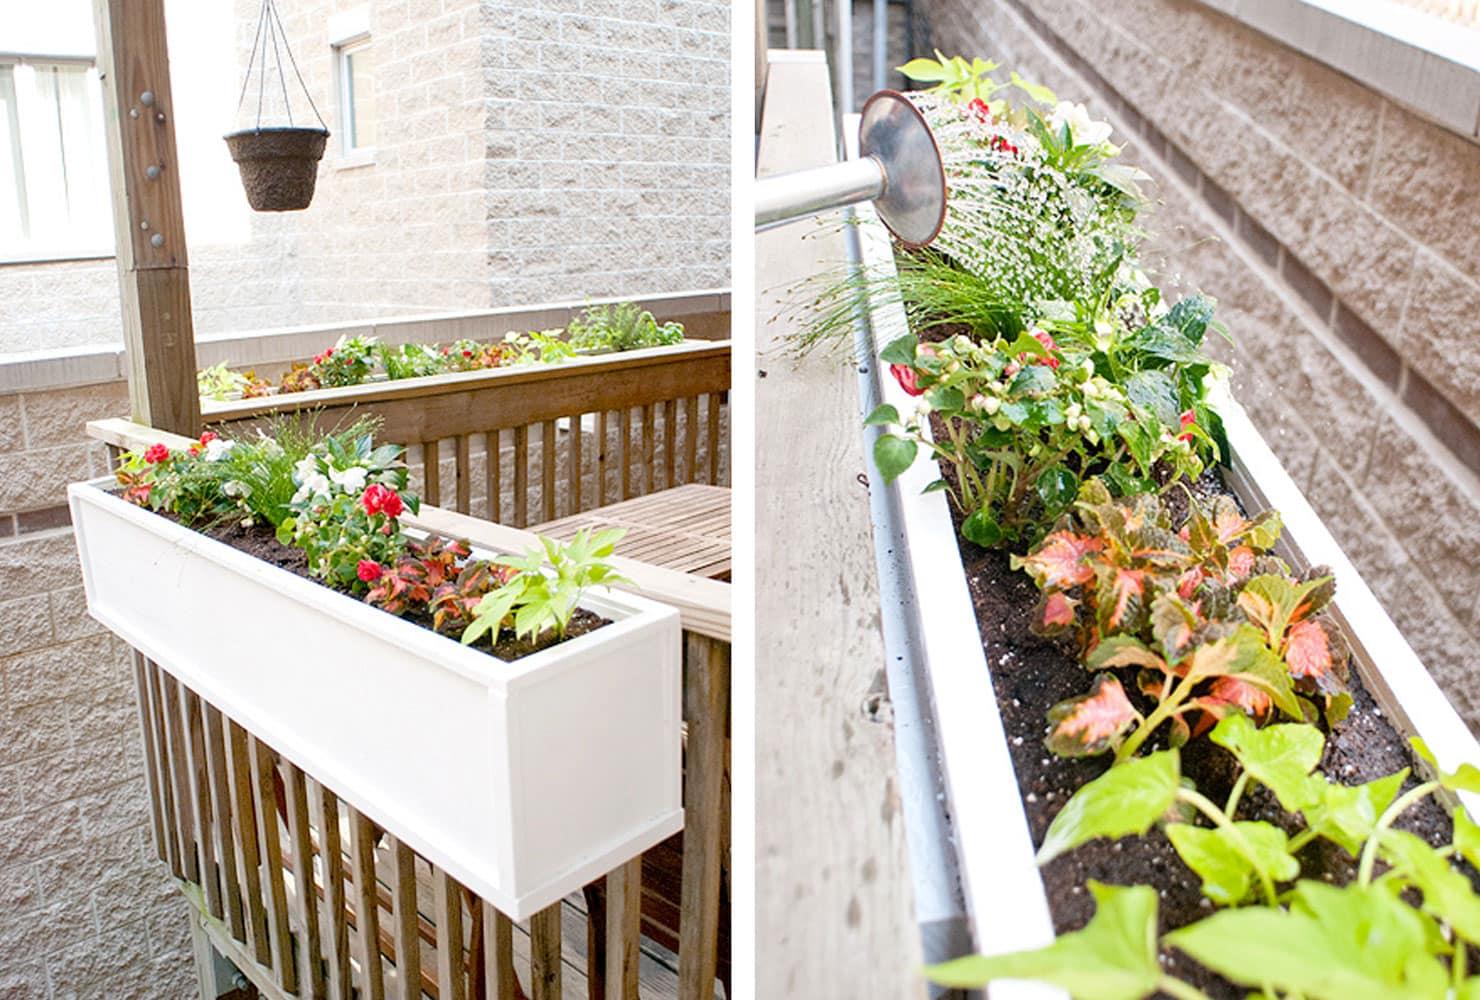 45+ DIY Patio Ideas to Brighten Your Space | Shutterfly on Backdoor Patio Ideas id=76933